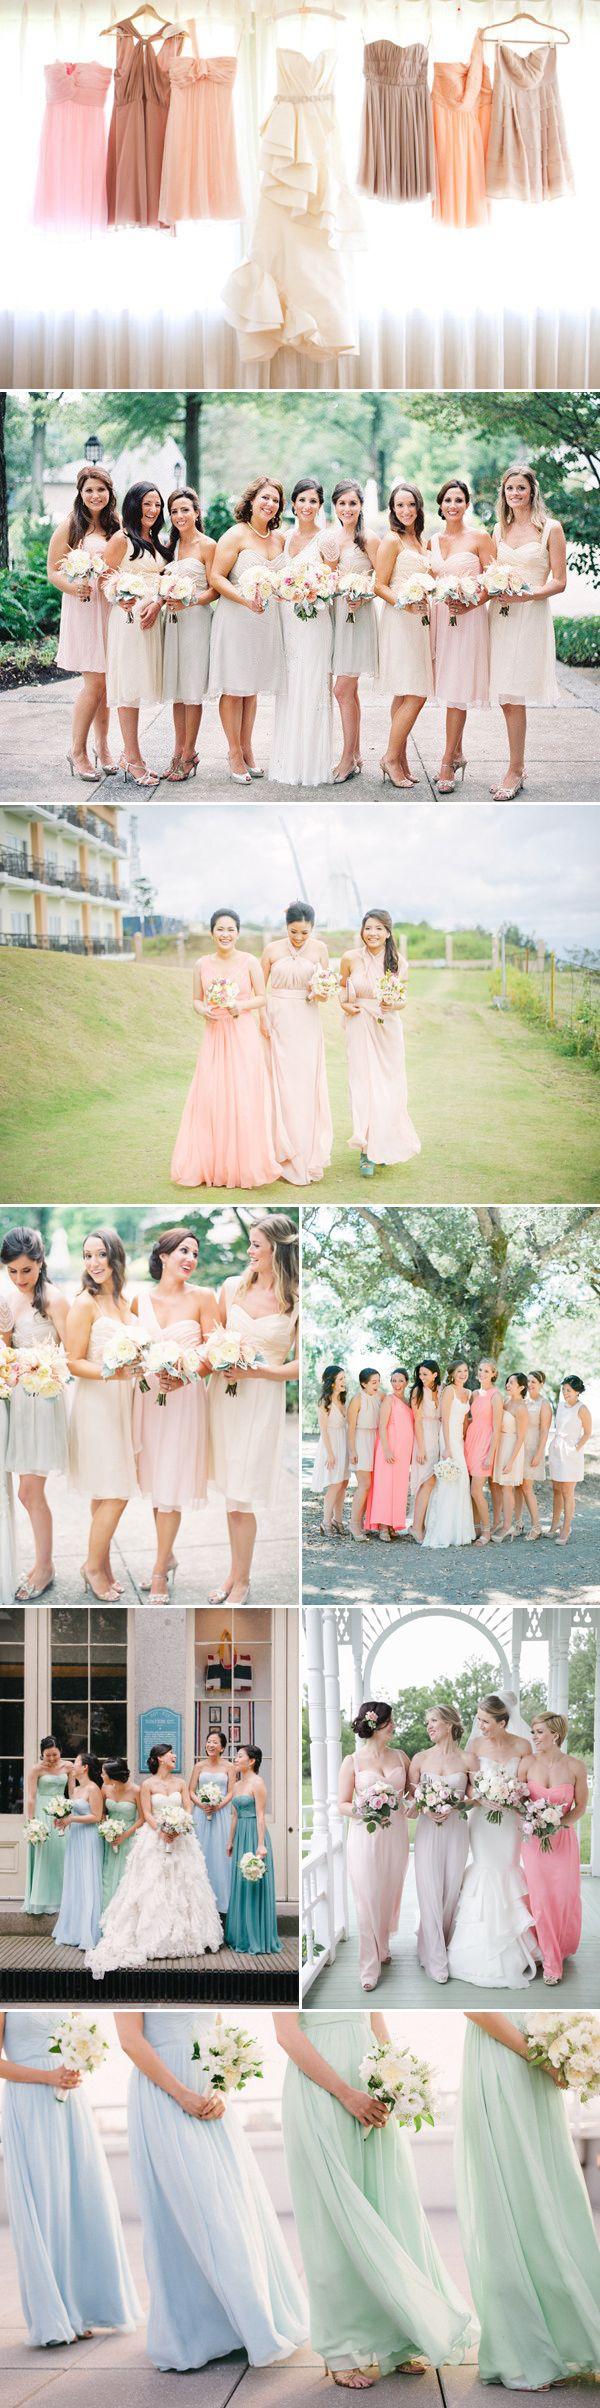 Pastel Mismatched Bridesmaid Dresses - Same Palette different styles... @k_pink03 @20miranda12 @sldaigle @lilymorgancuret @tahjsmama